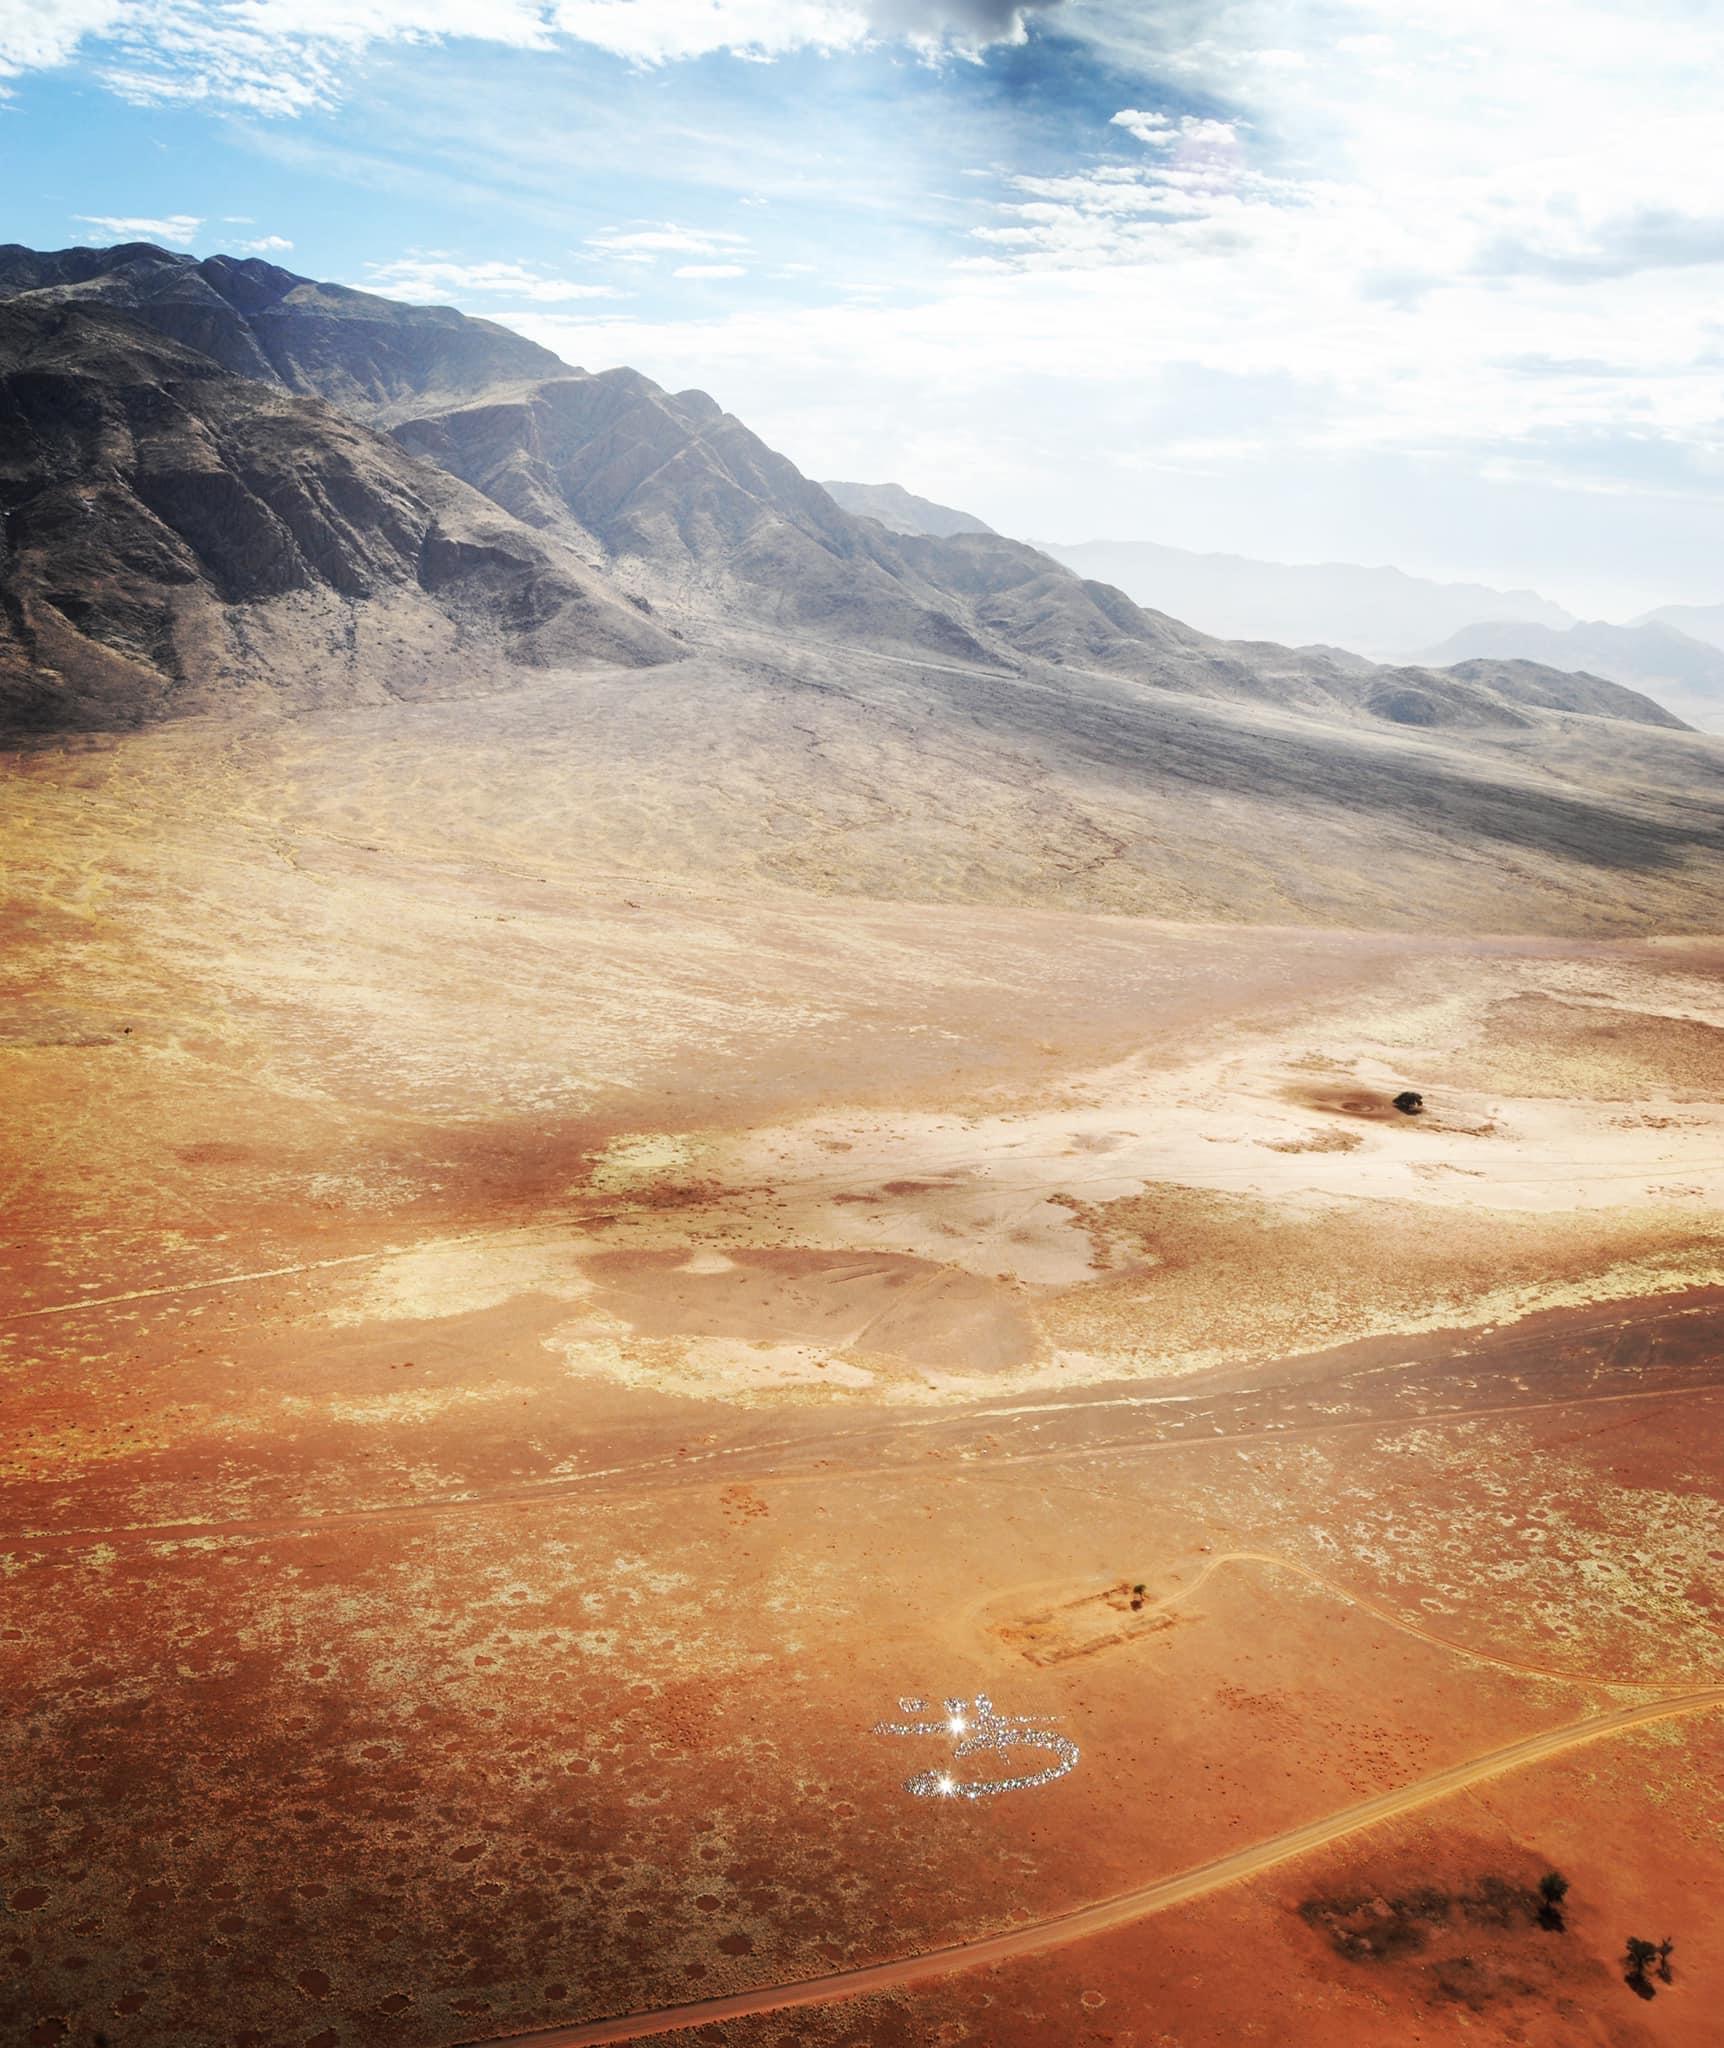 Namibia-Signature-of-light-car-mirrors-light